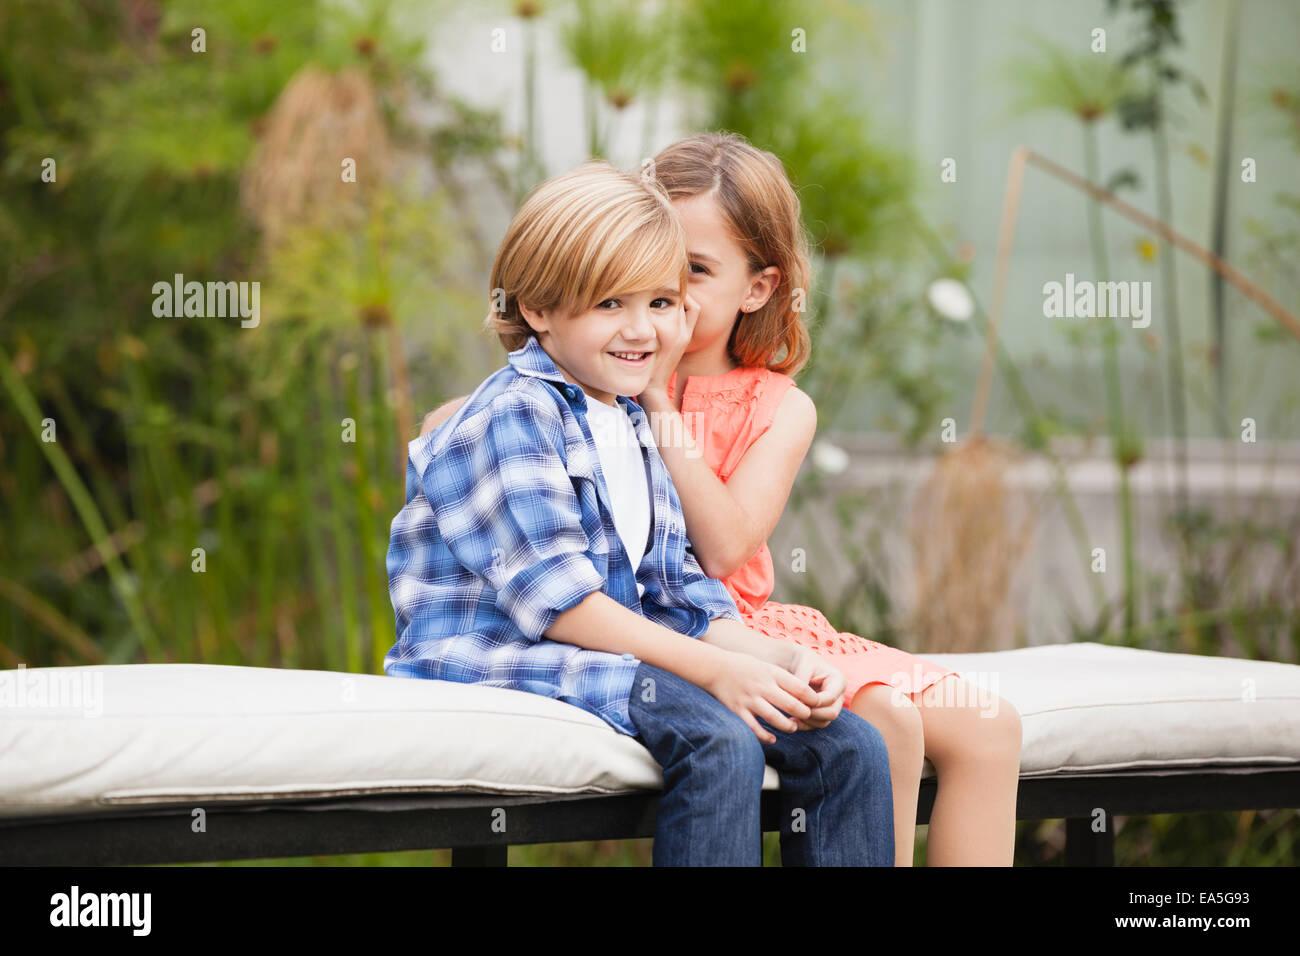 Girl whispering into boy's ear - Stock Image